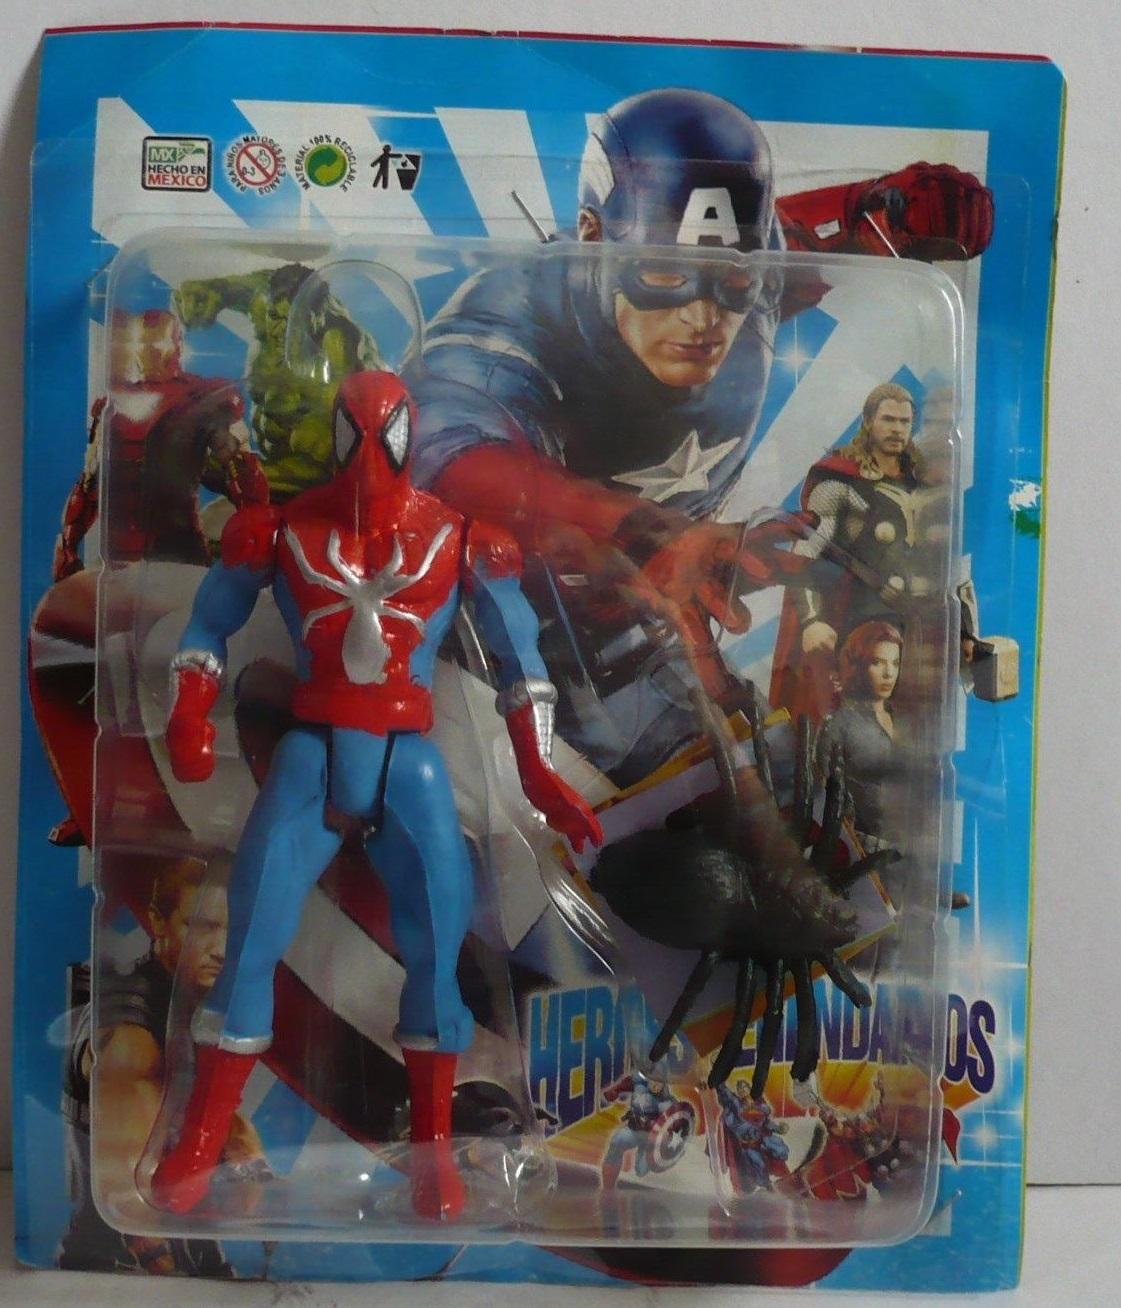 Spider-Man (Legendary Heroes figure)